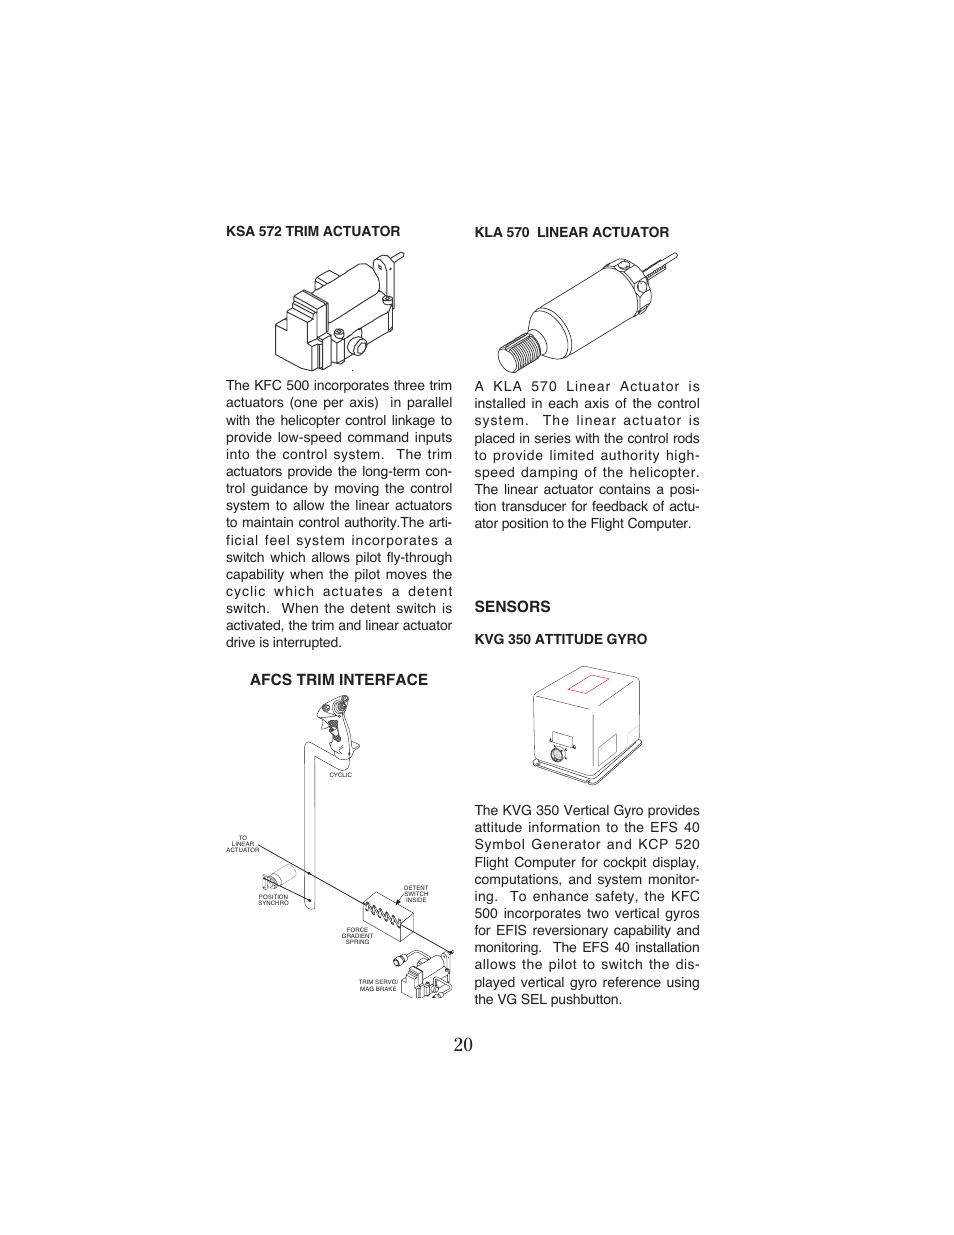 Sensors, Afcs trim interface   BendixKing KFC 500 User